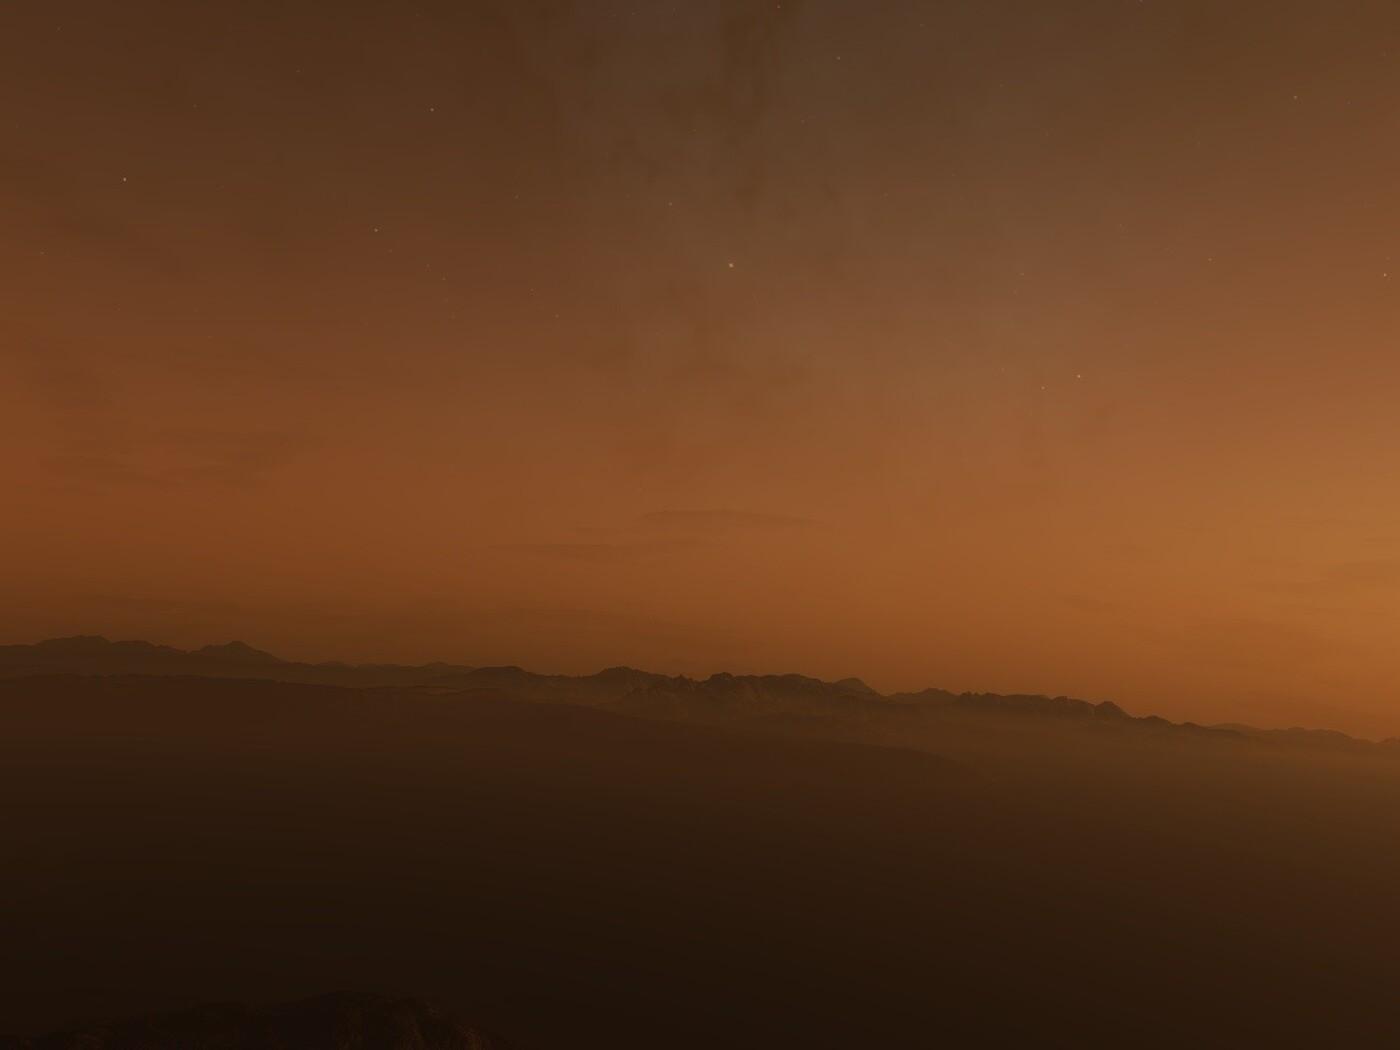 mars-digital-planet.jpg